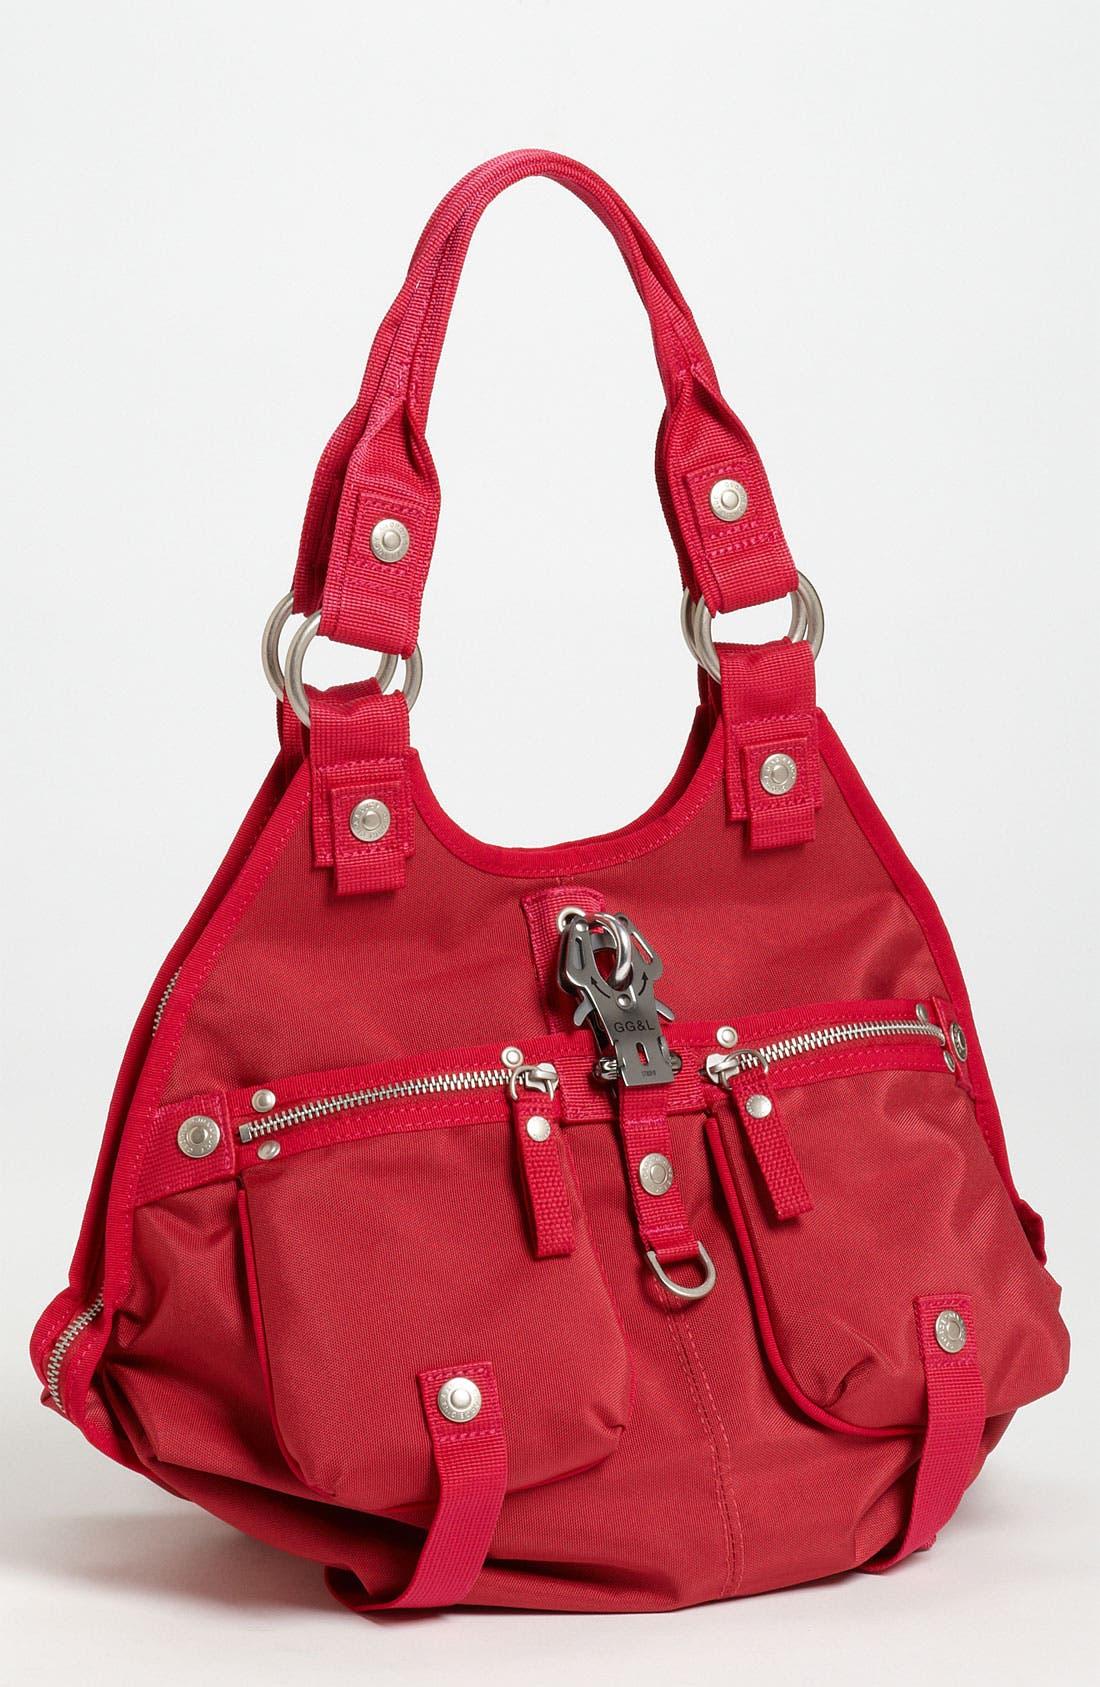 Alternate Image 1 Selected - George Gina & Lucy 'Love Affair' Shoulder Bag